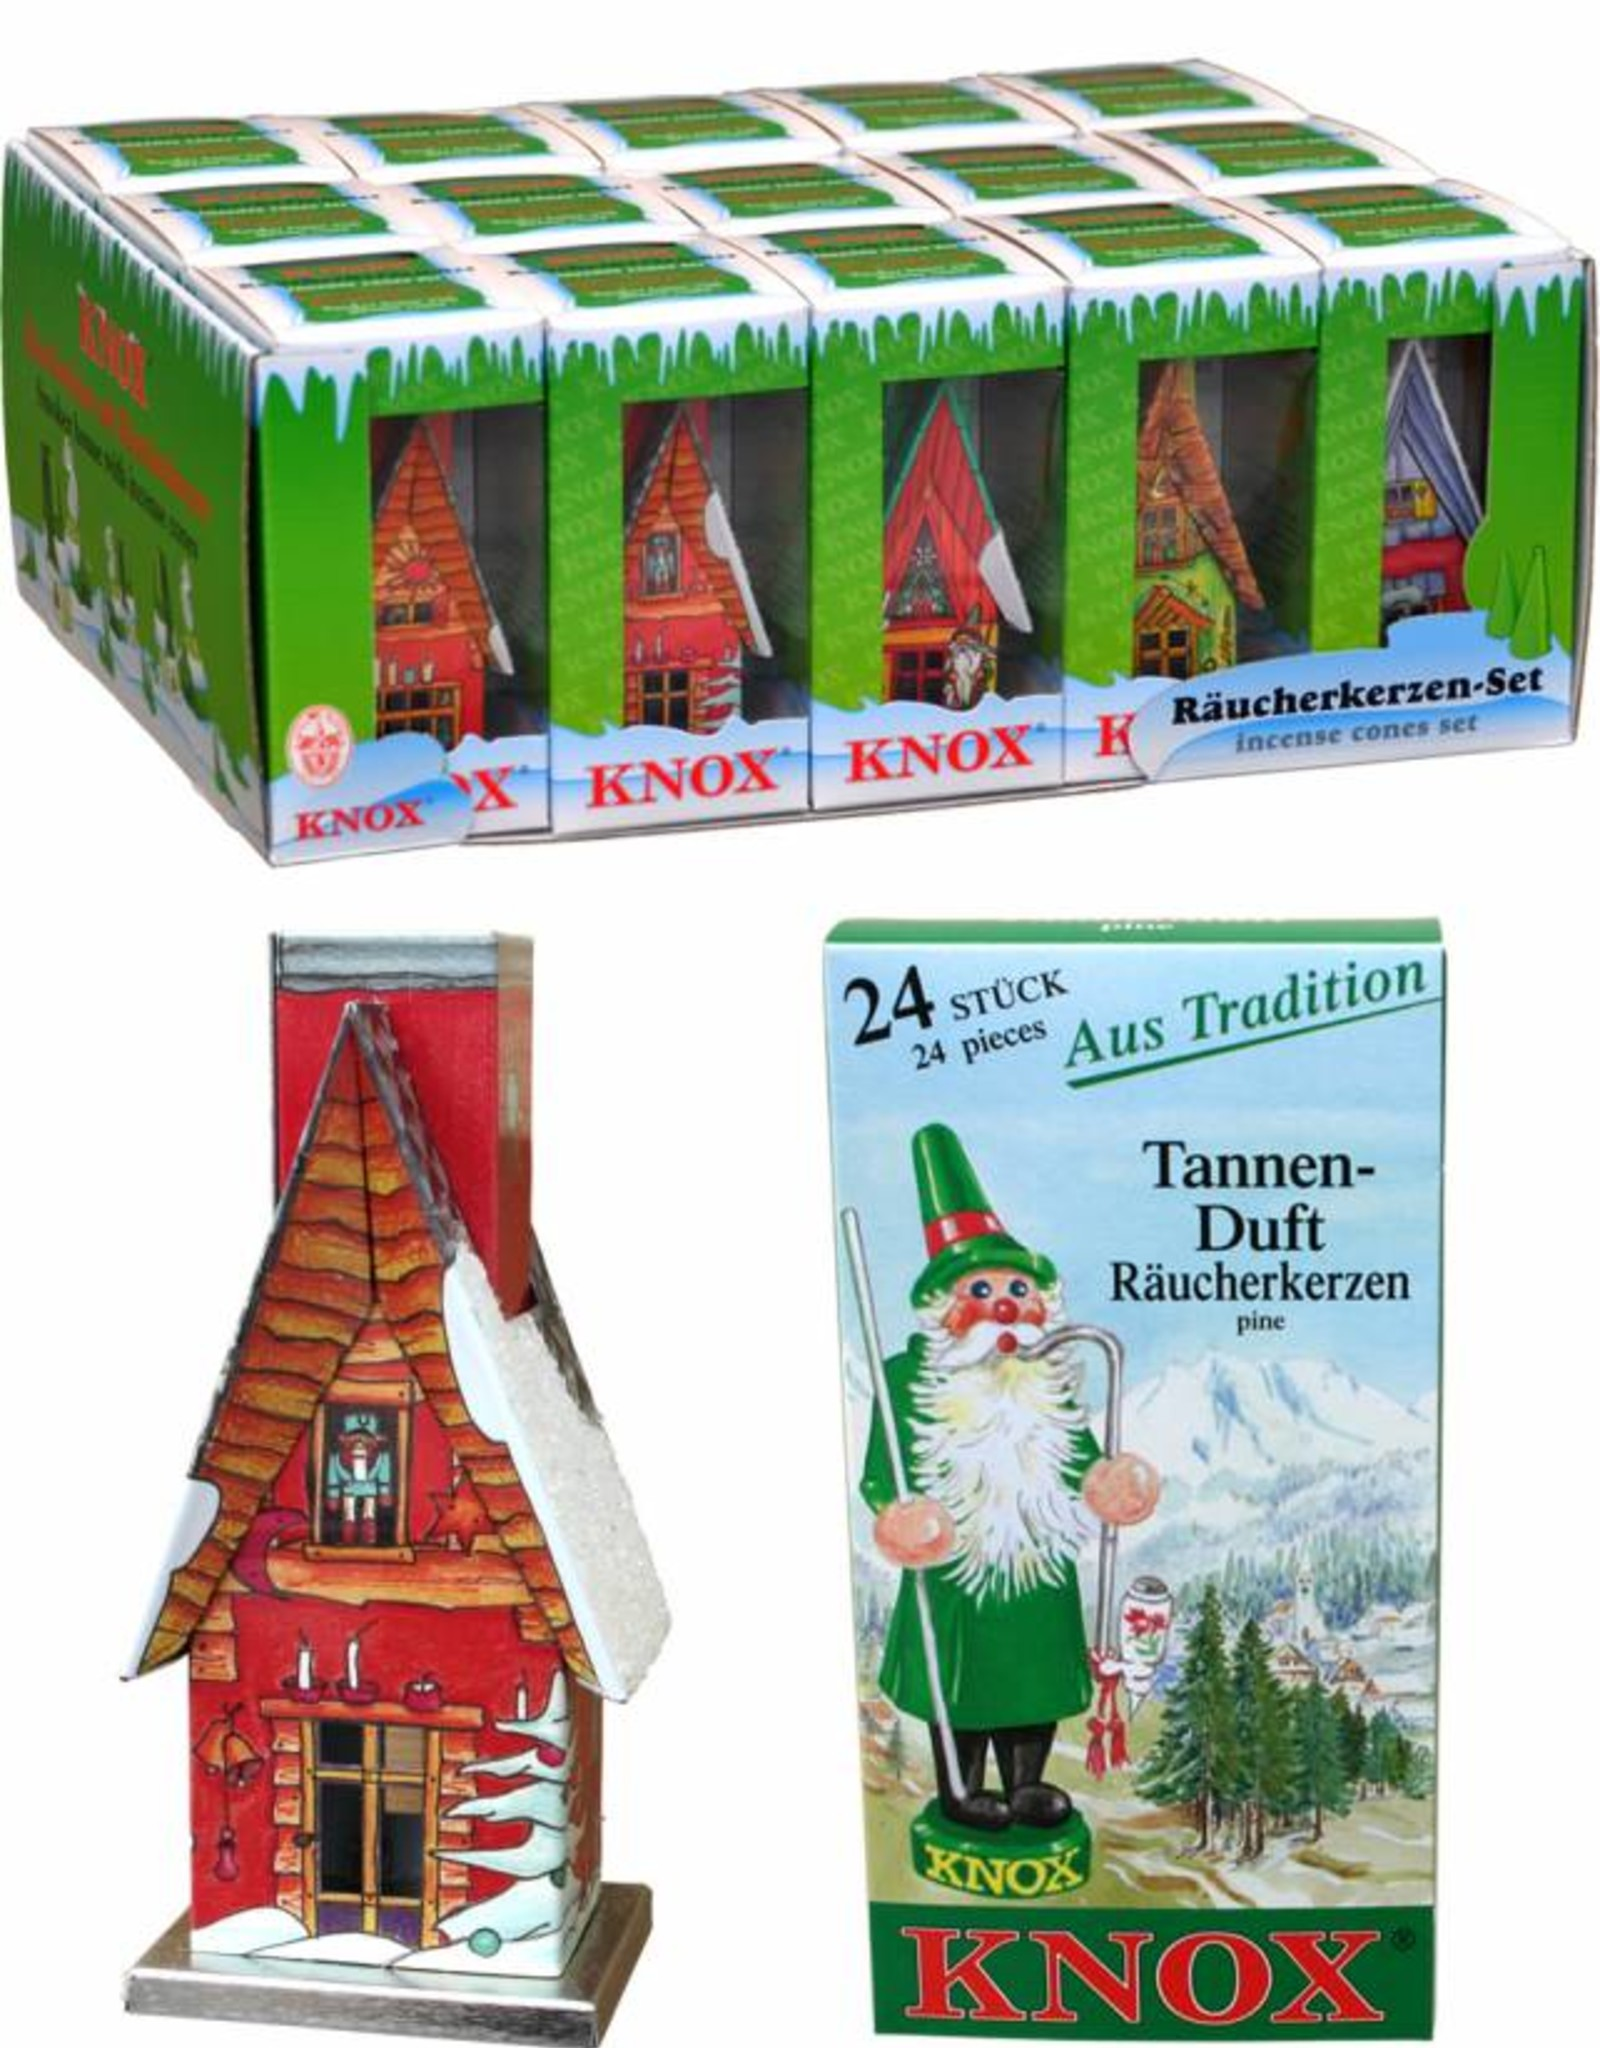 German Smoker Hut with Incense